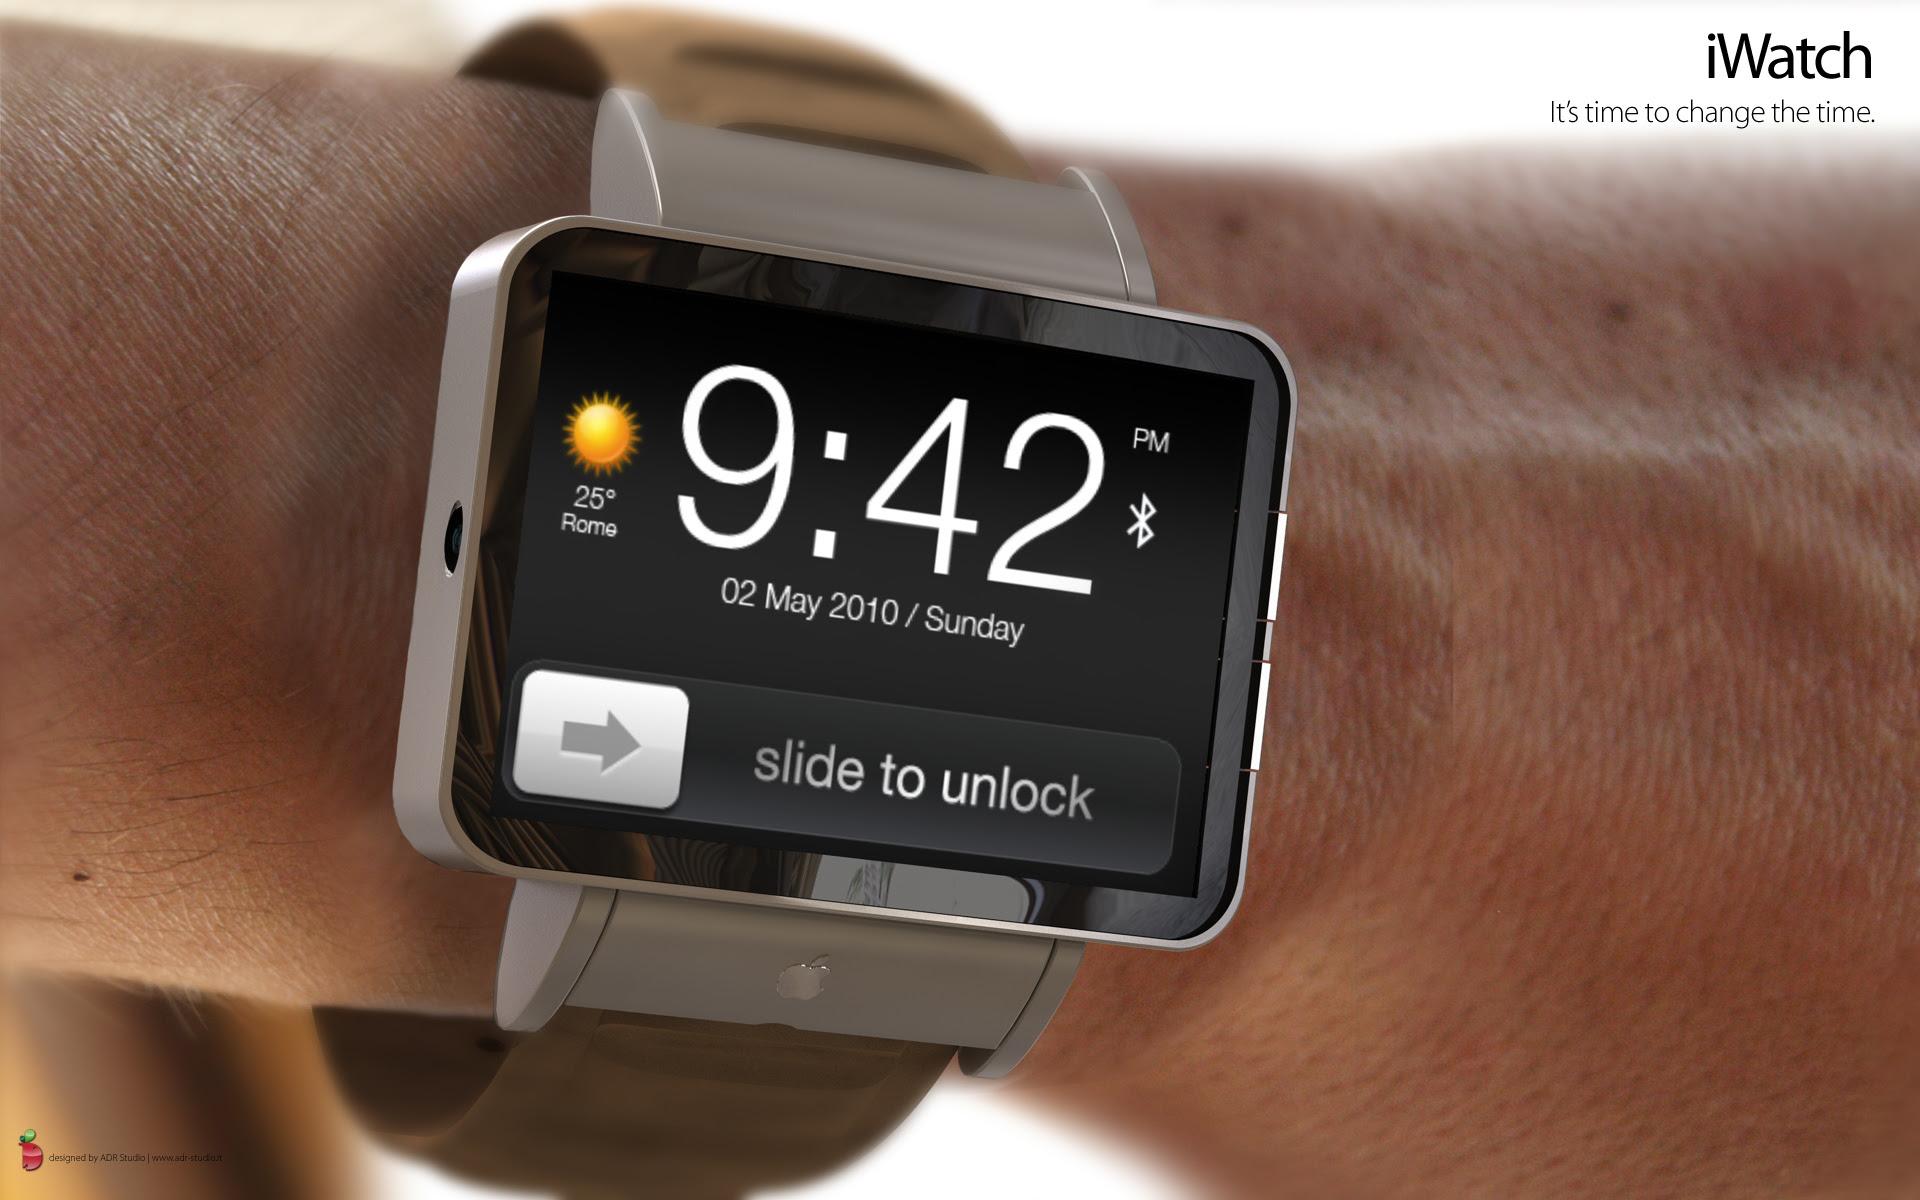 Apple iWatch To Run Full iOS Platform